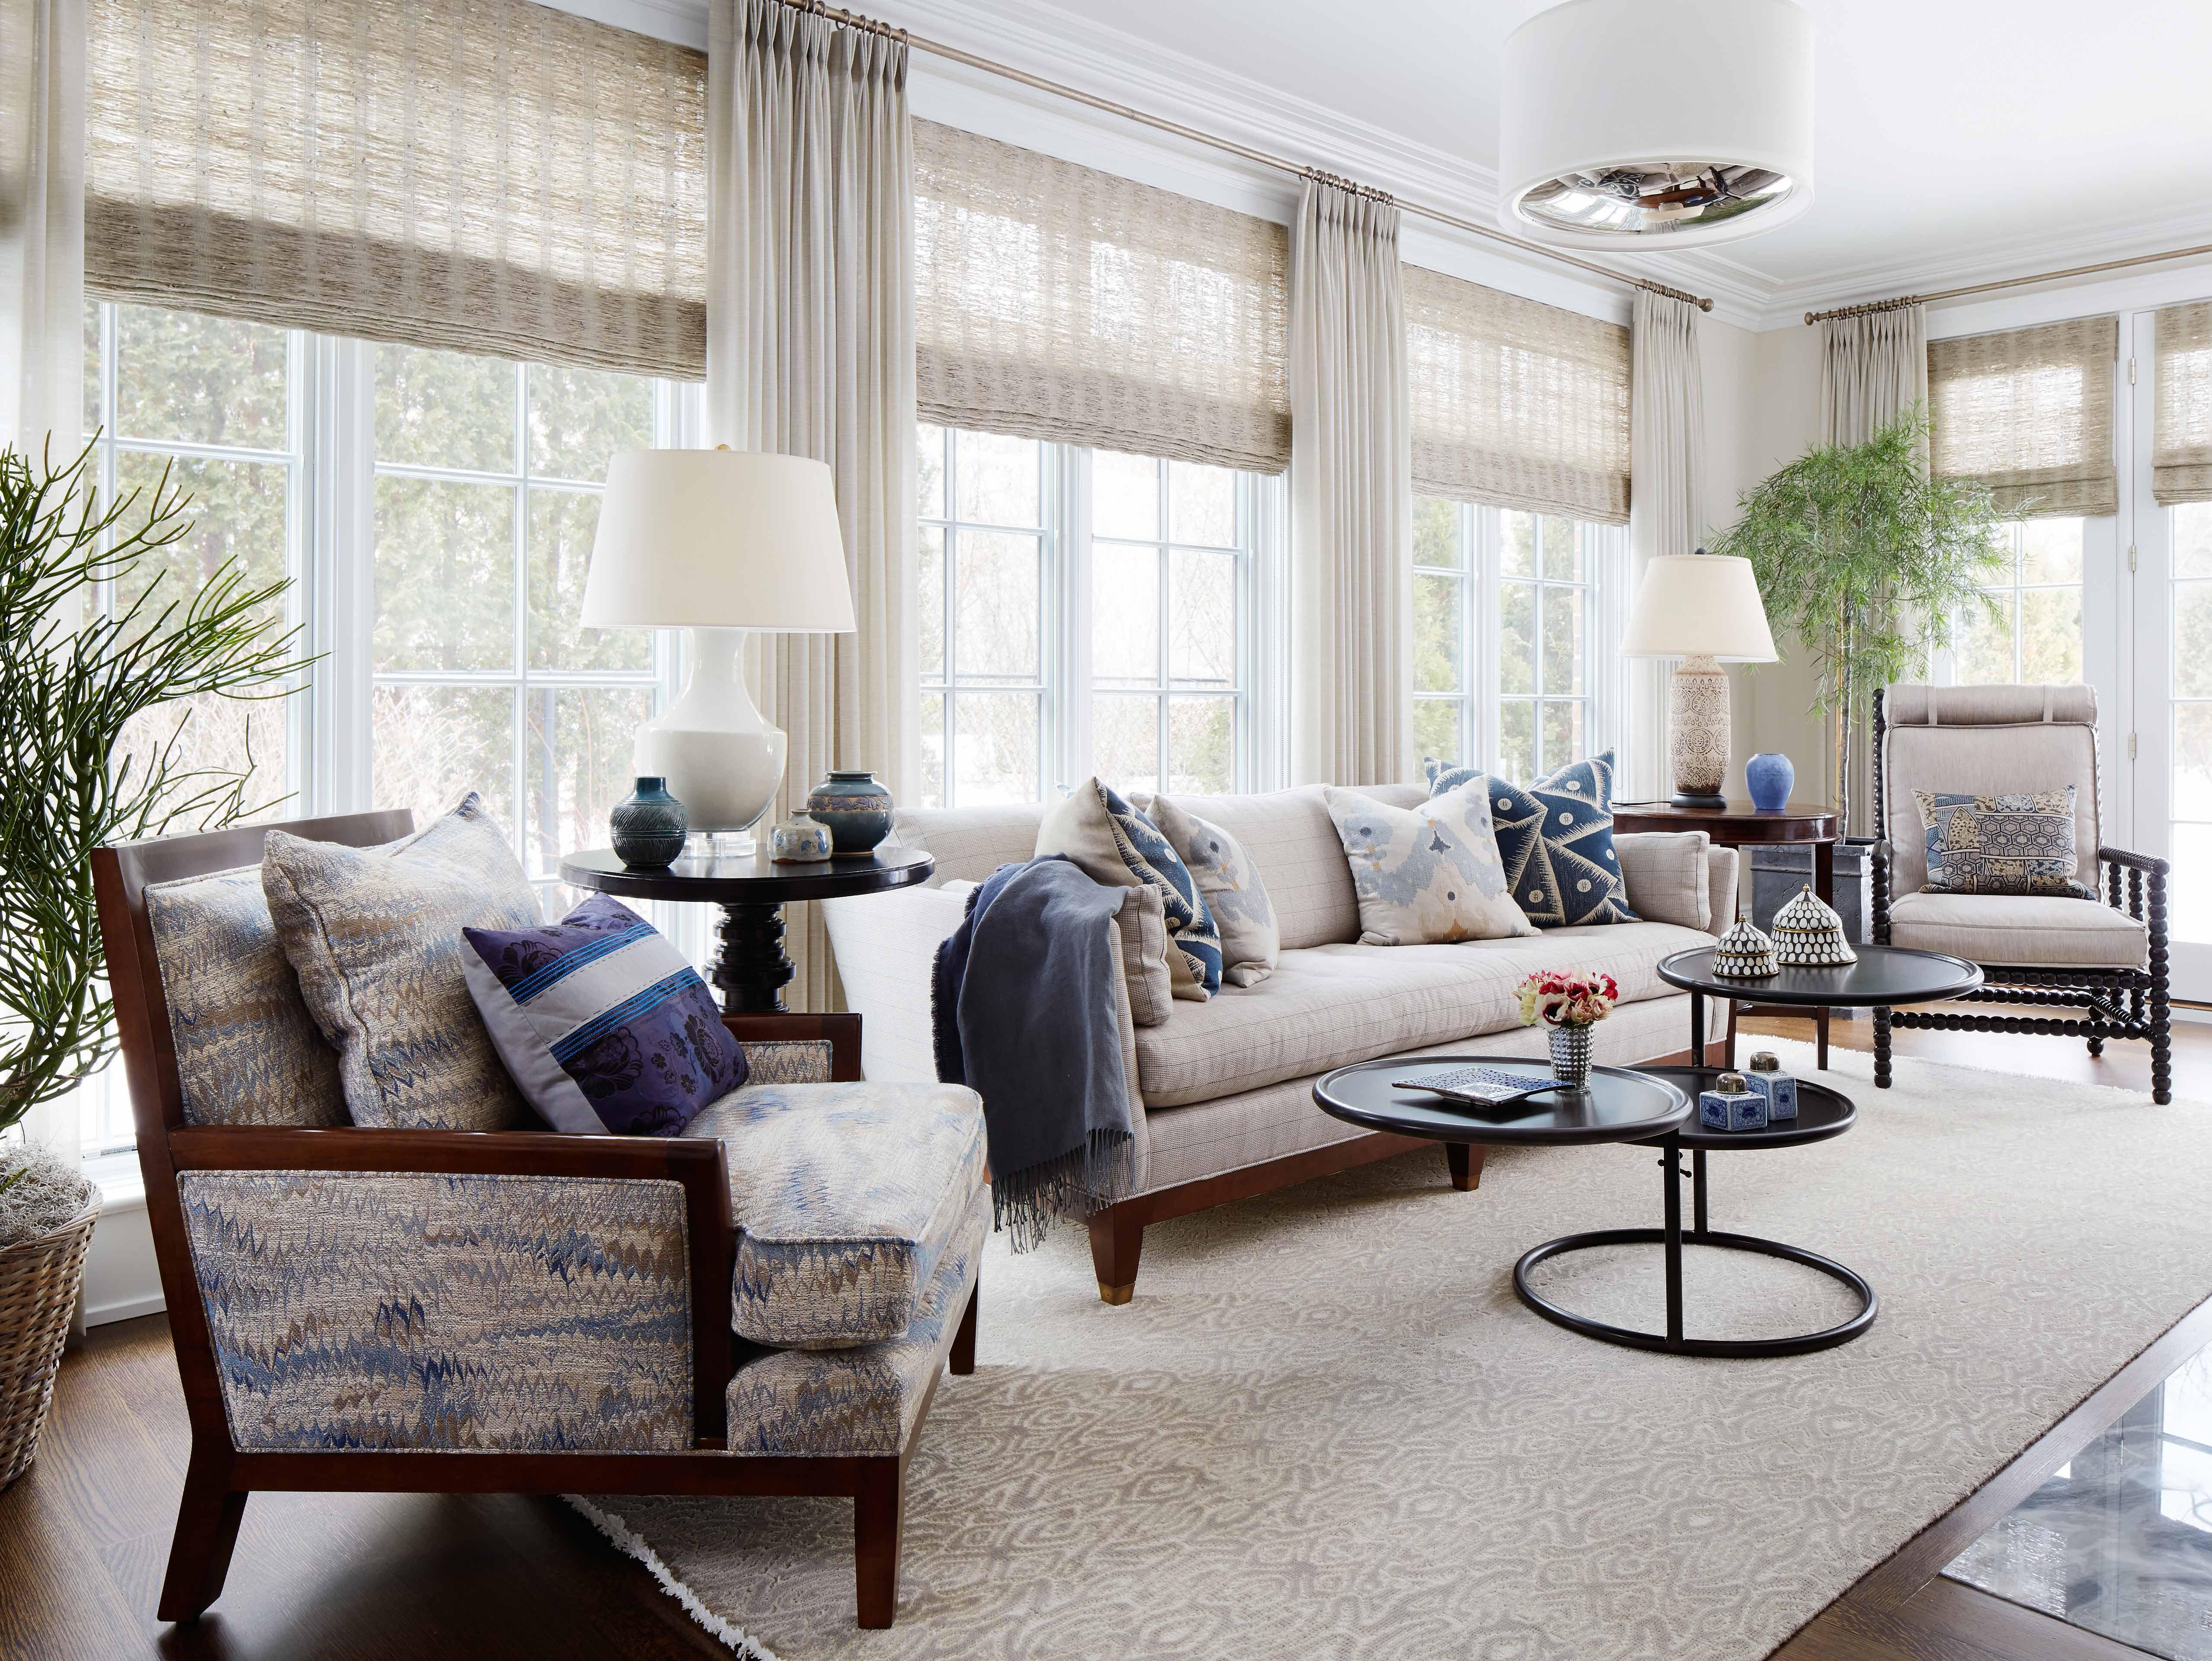 Highland Park Home Designed by Luxe Design Firm - Soucie Horner, Ltd.